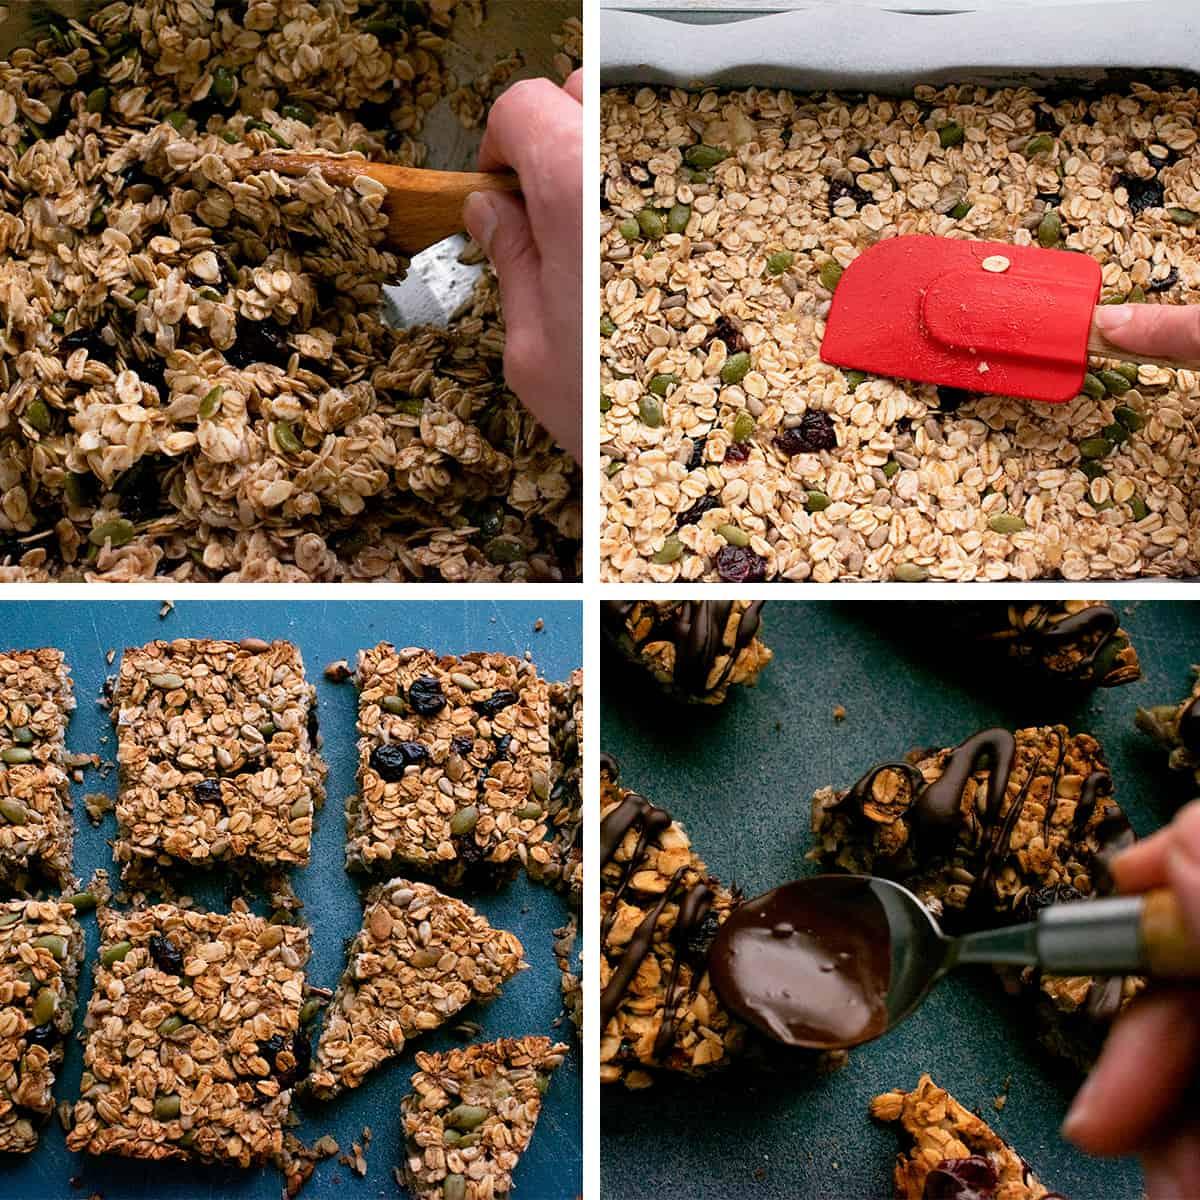 proceso para preparar barritas de avana